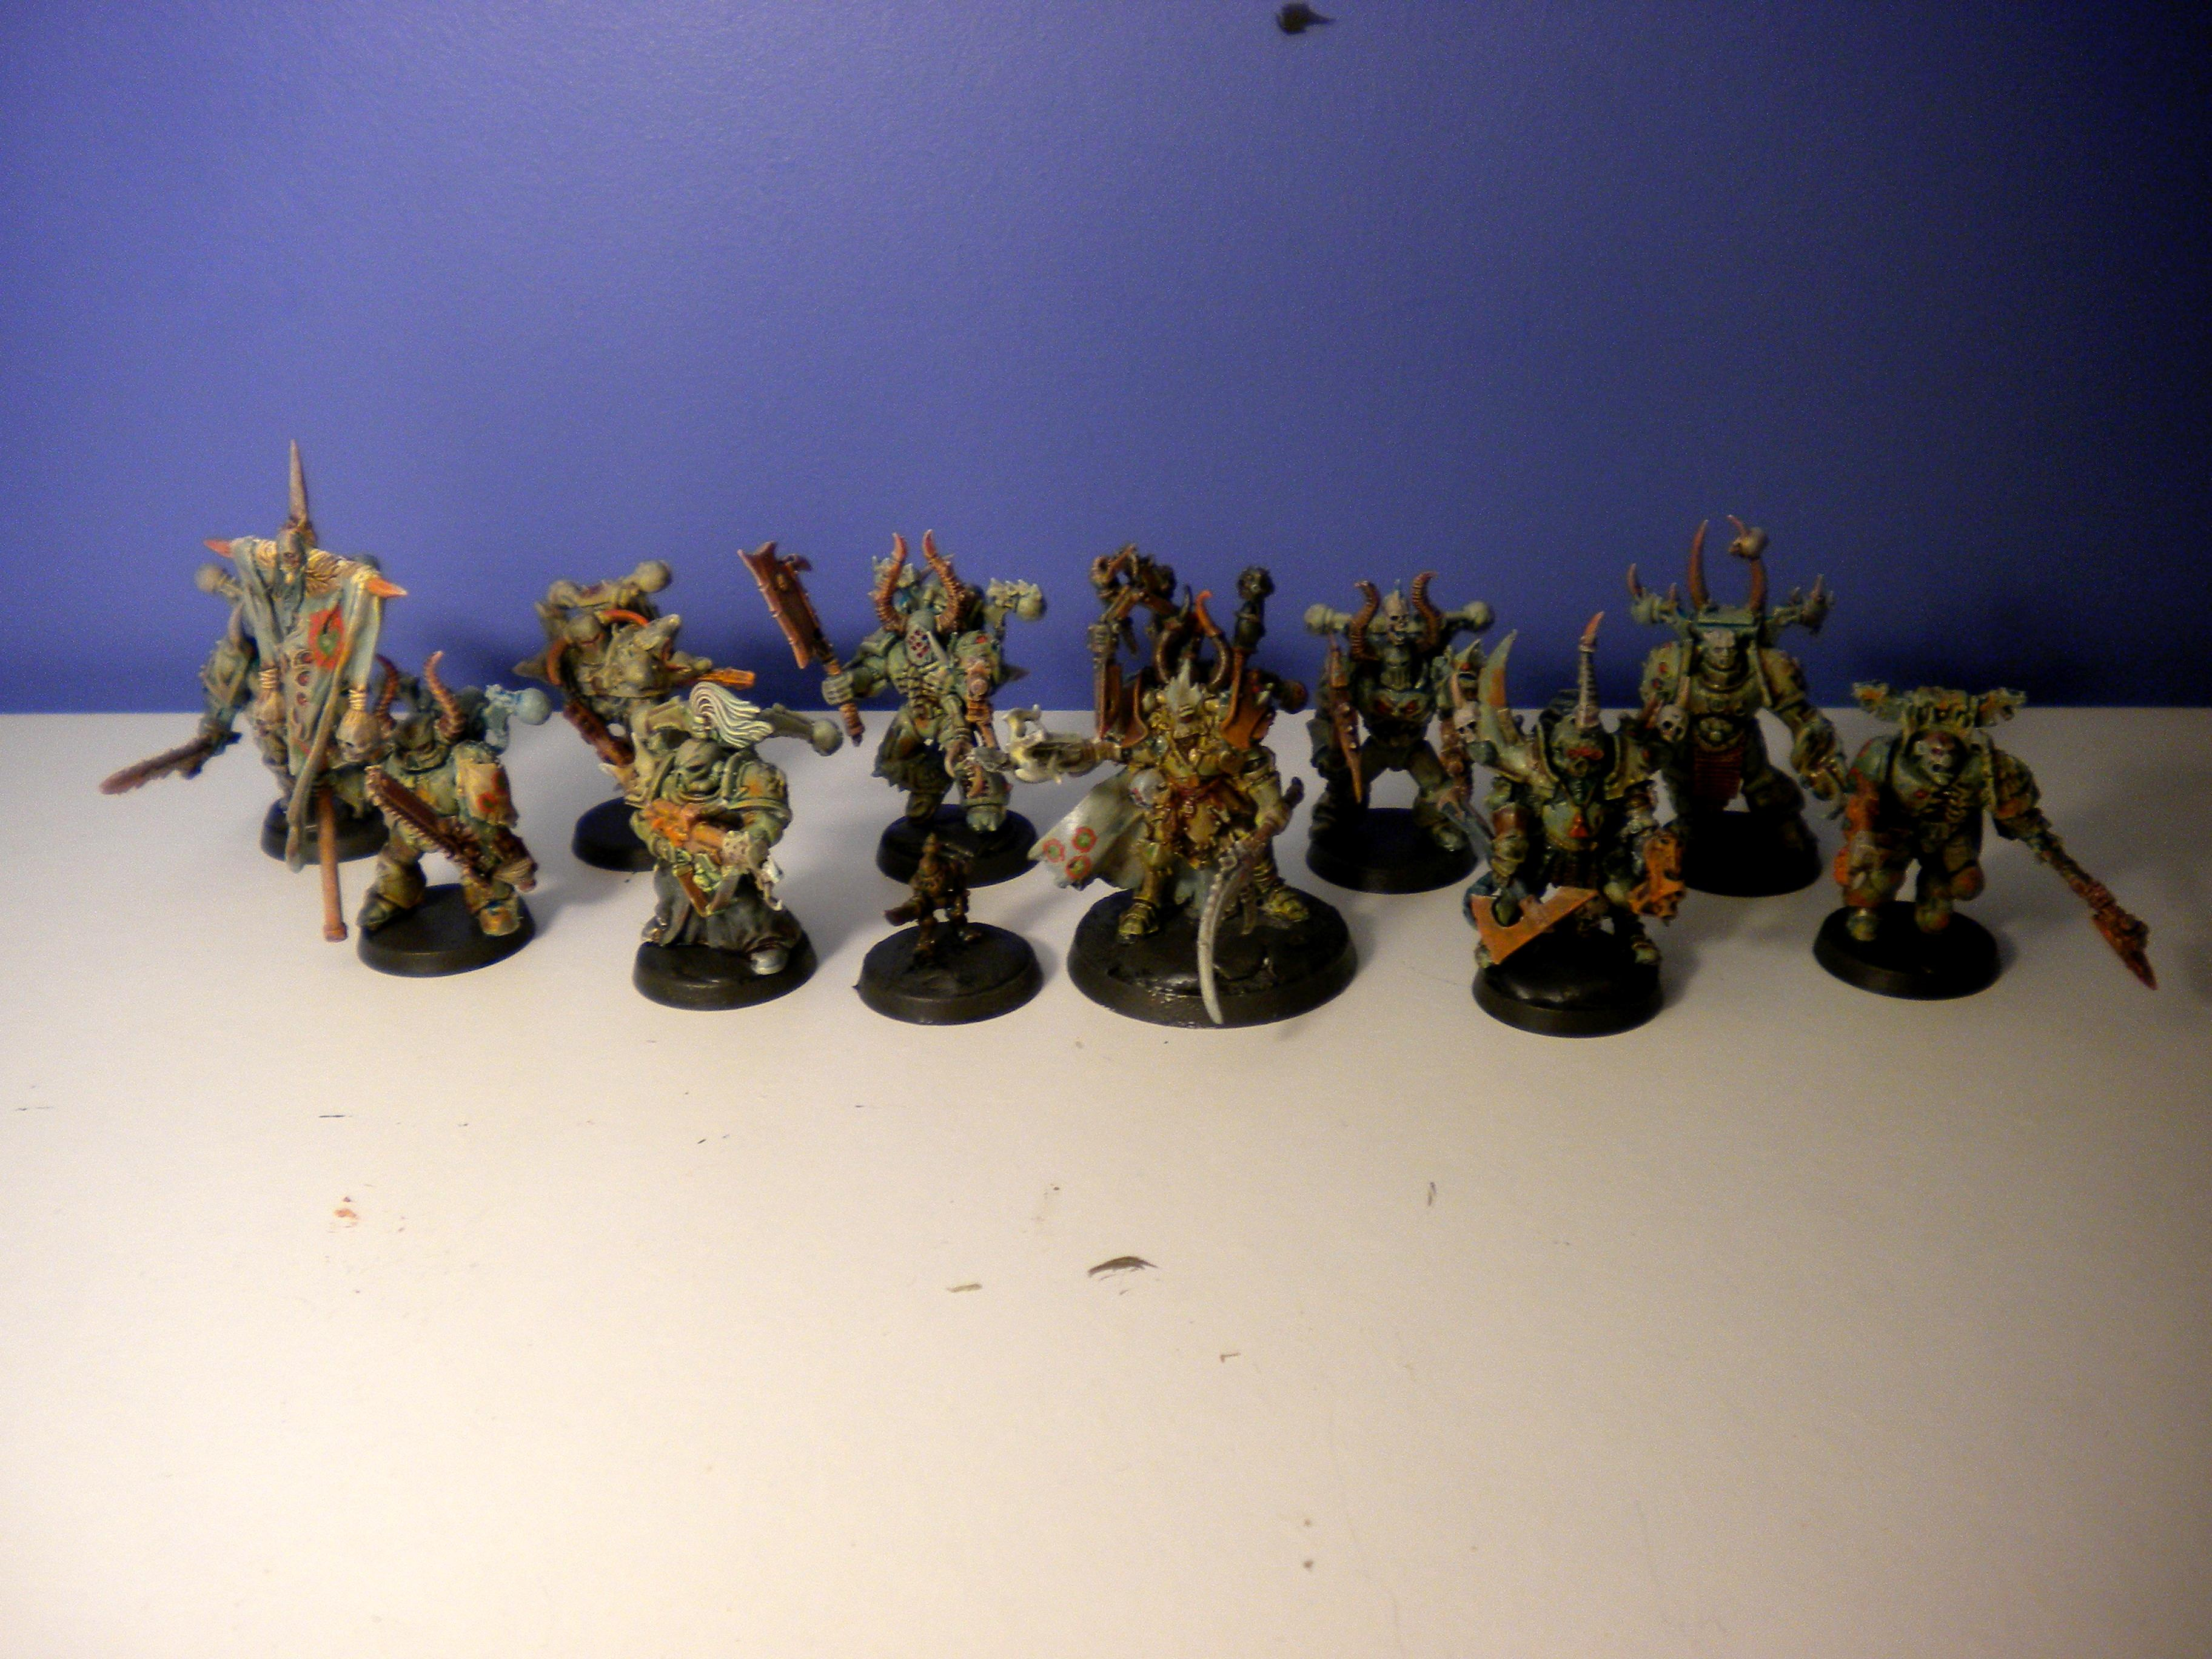 Chaos, Chaos Army, Chaos Rhino, Chaos Space Marines, Conversion, Daemon Prince, Defiler, Nurgle, Nurgle Army, Painted Chaos, Plague Marines